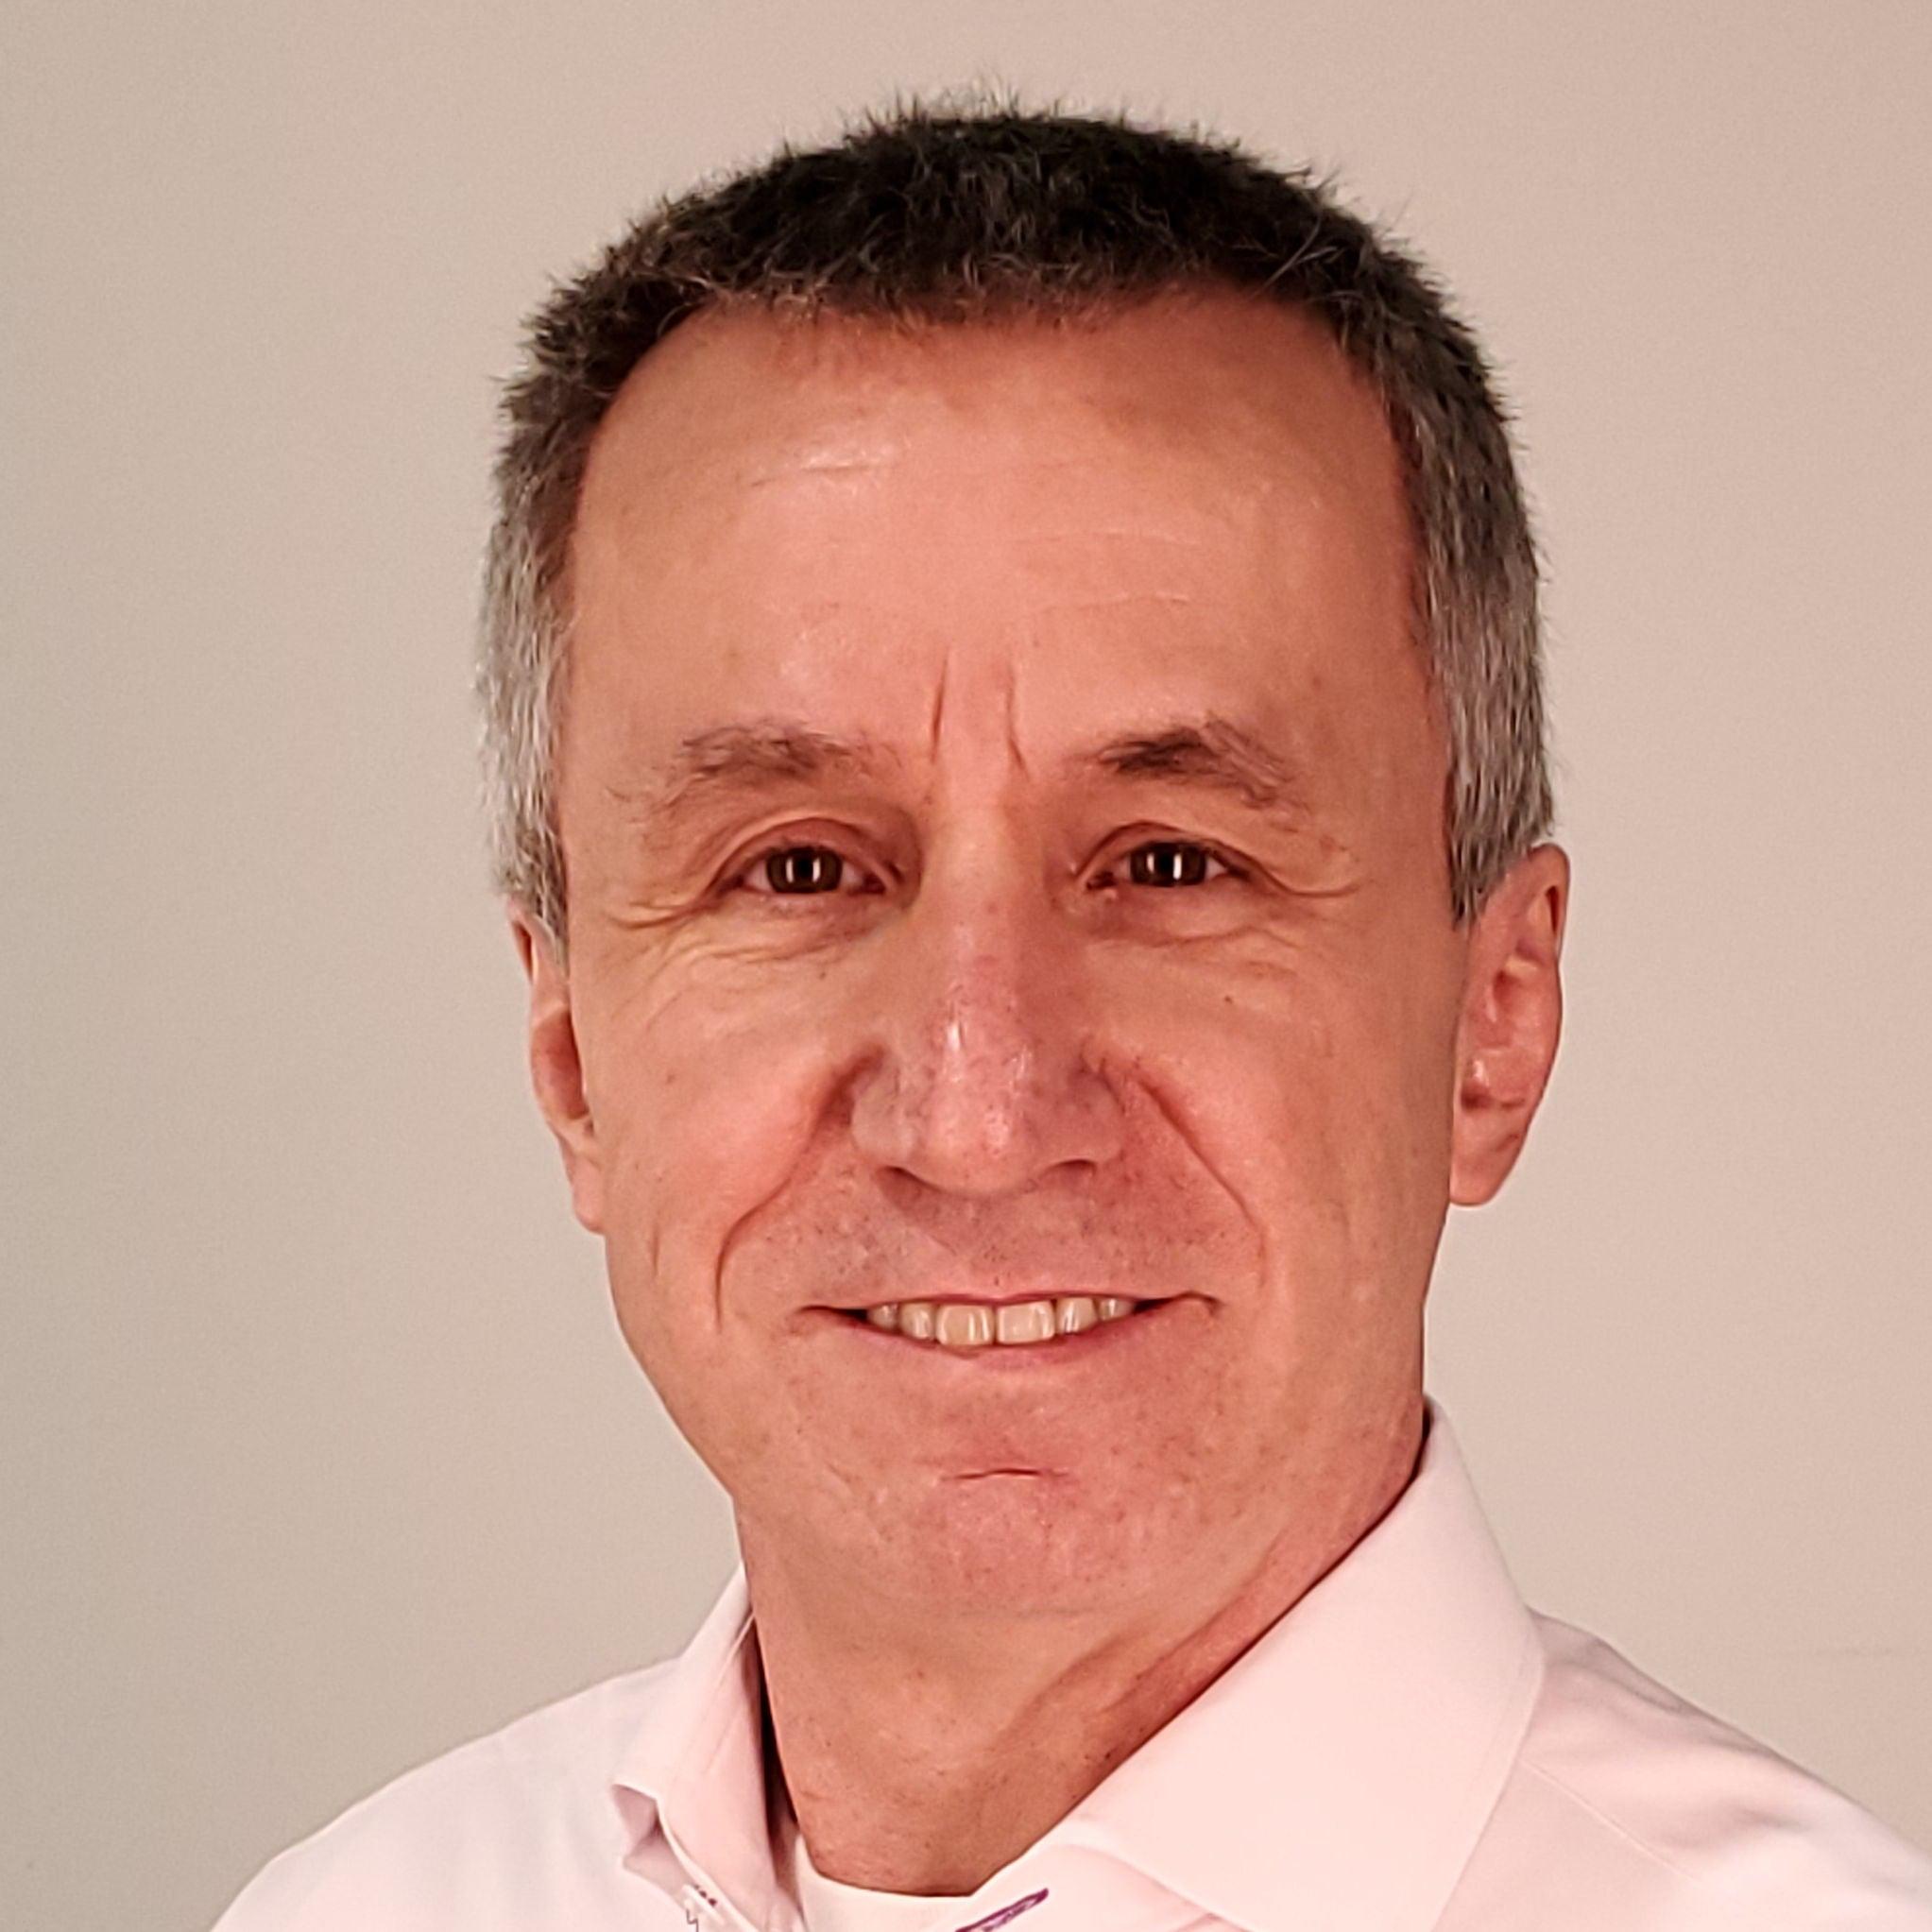 Paolo Gaudiano